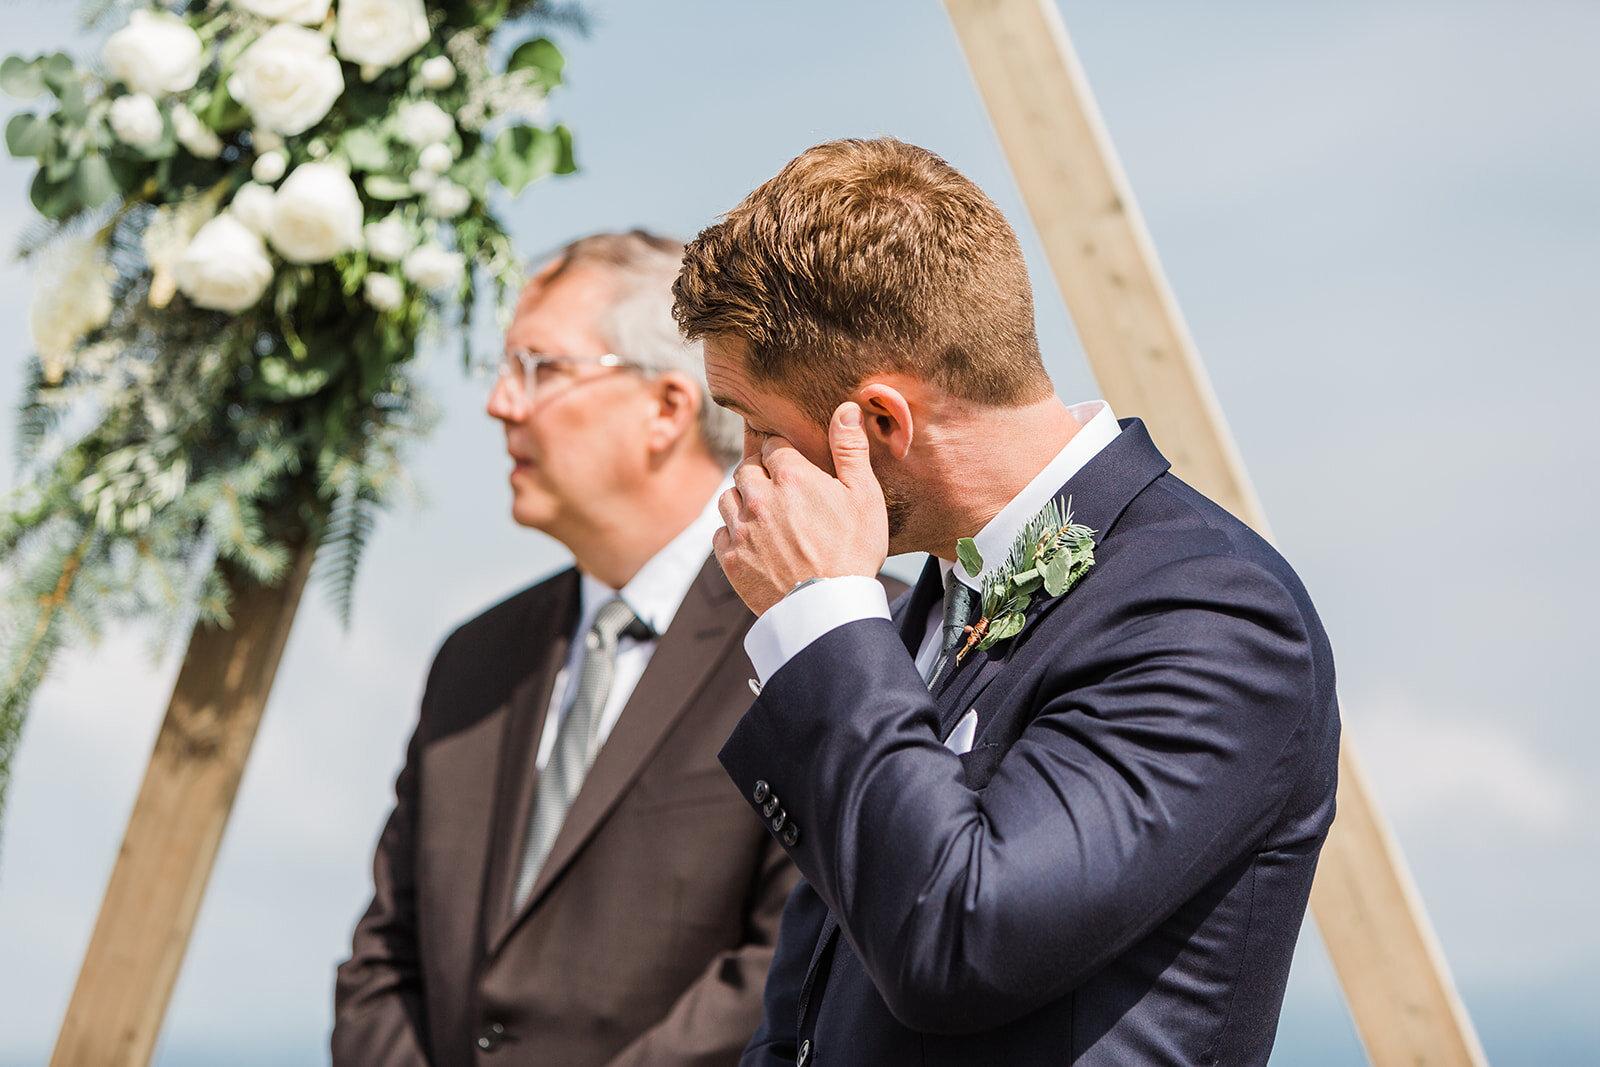 bride and groom first look spokane wedding ceremony